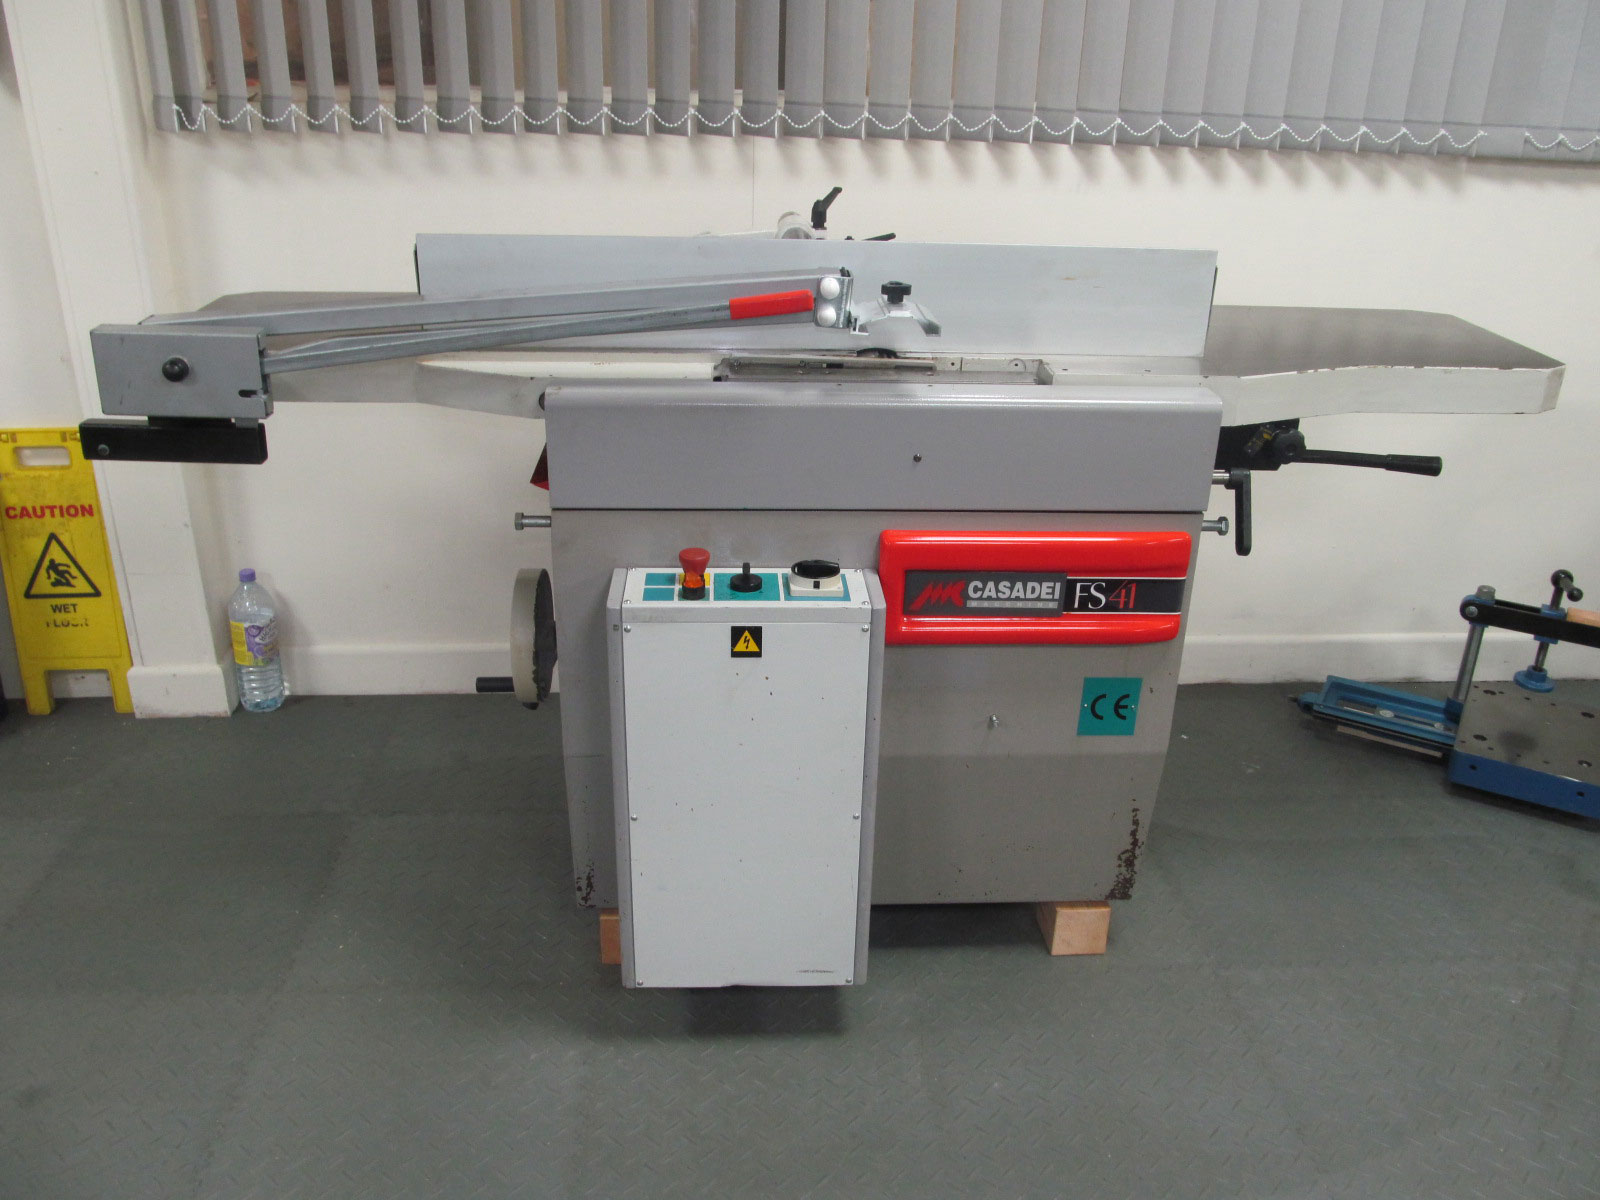 Casadei FS41 planer thicknesser